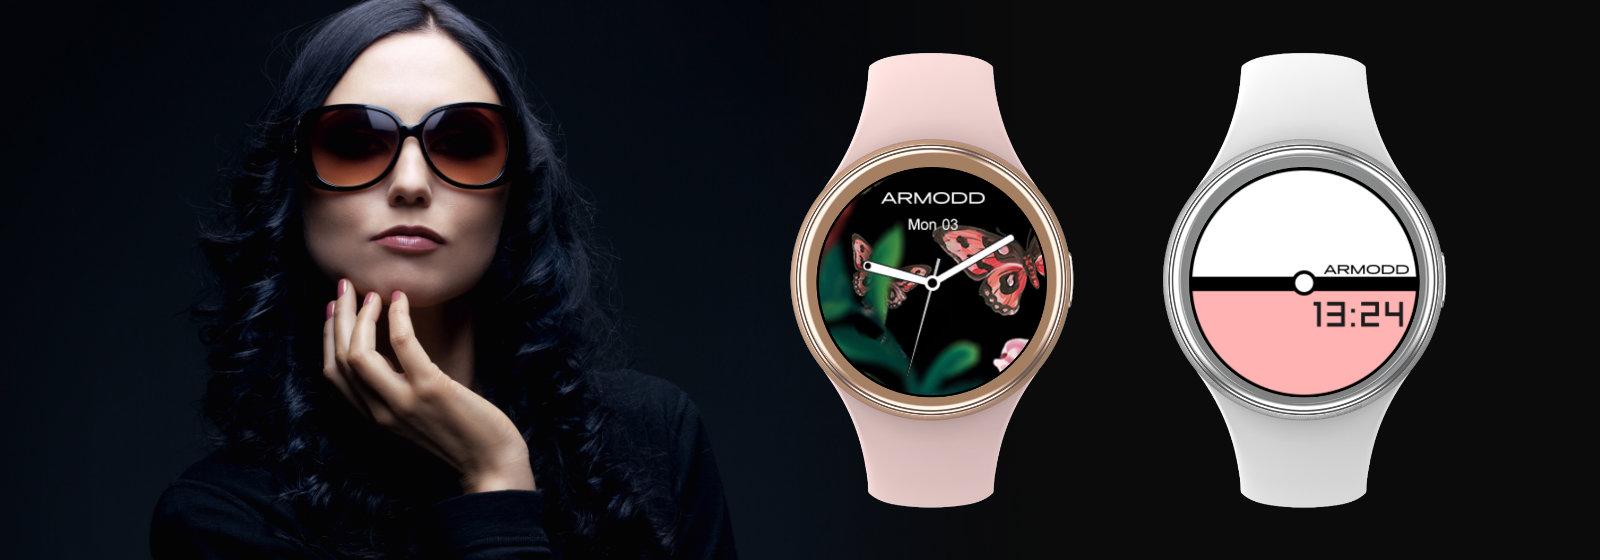 ARMODD Wristcandy 2